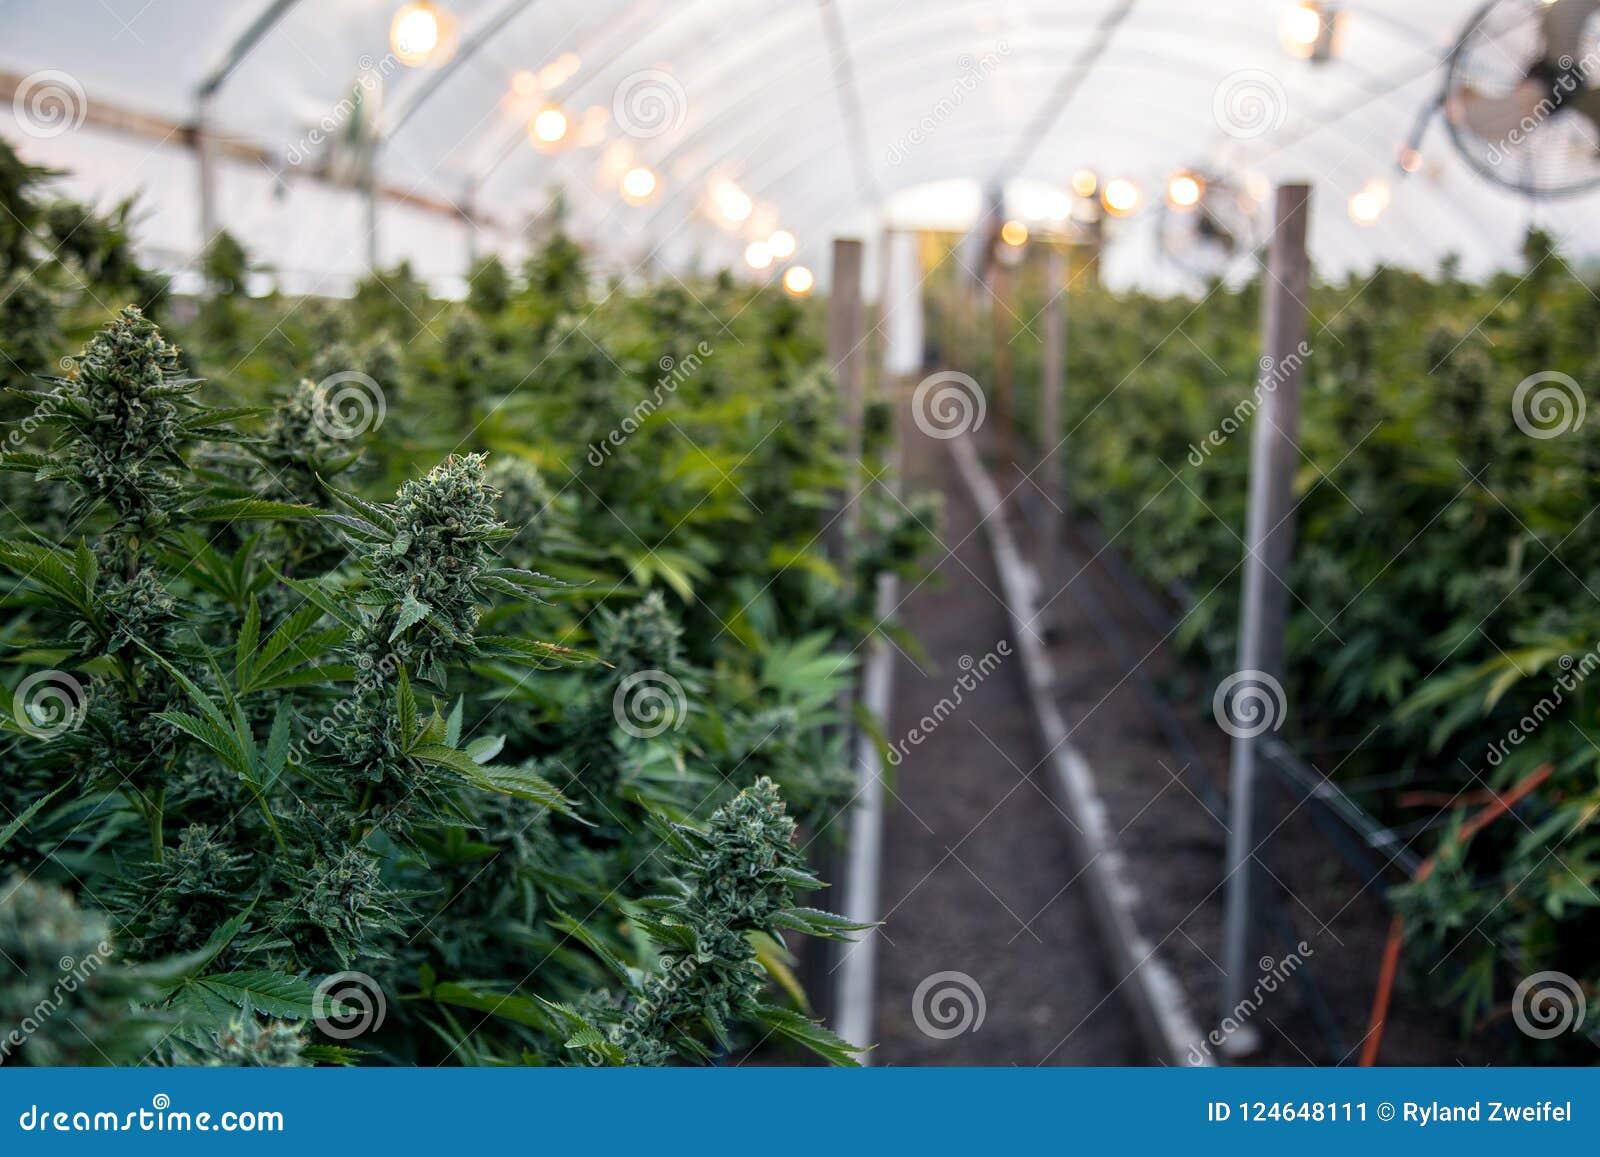 Cannabisknoppen in serre